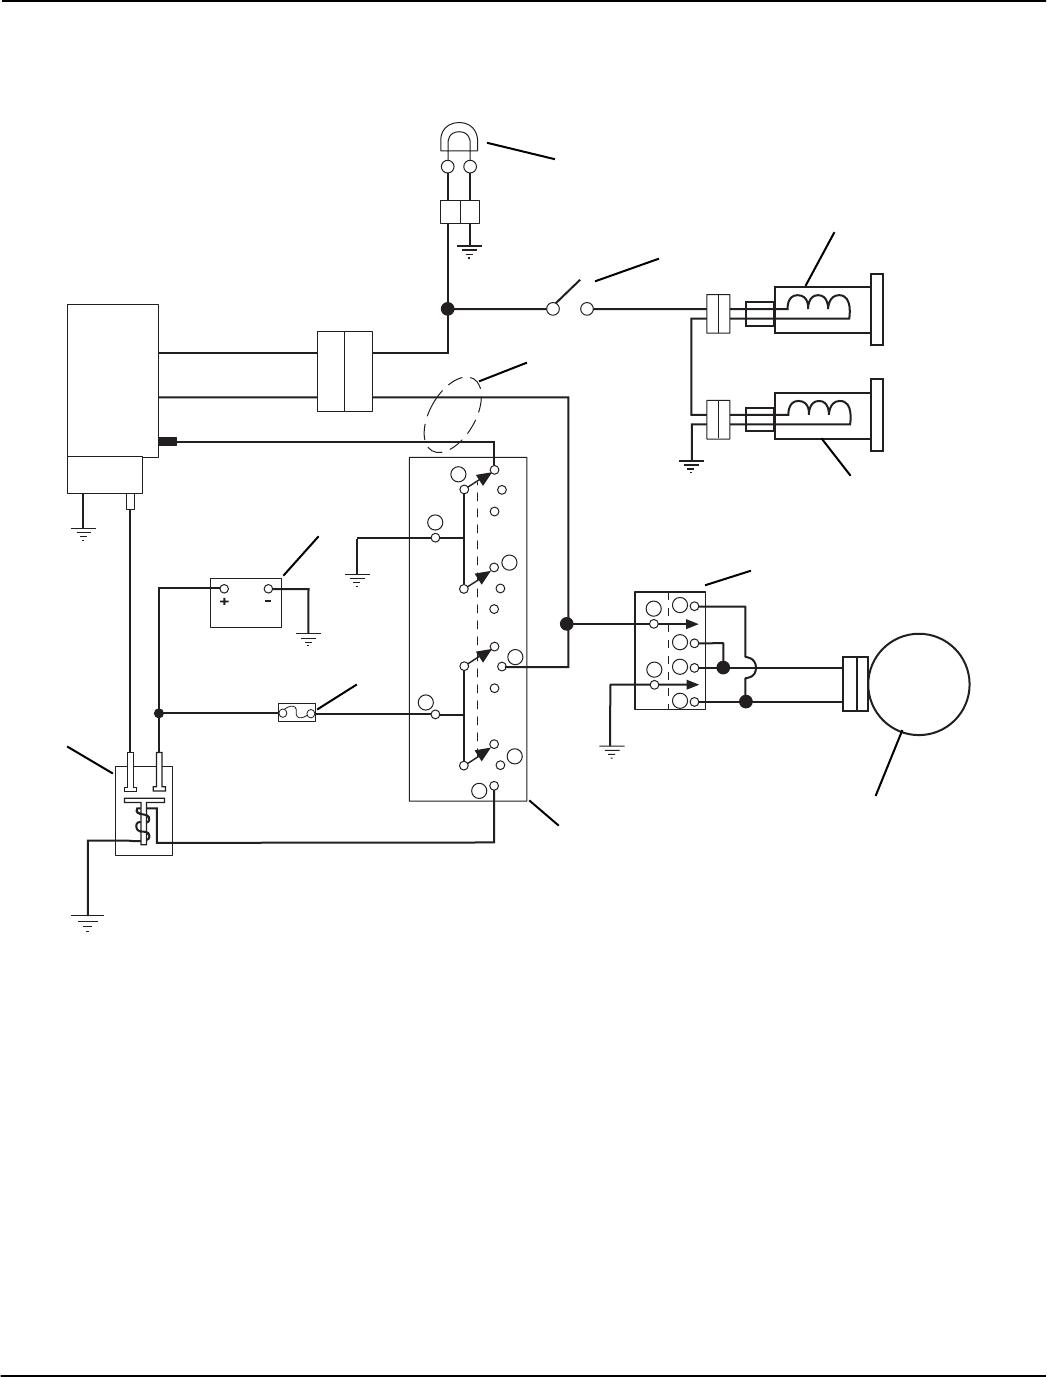 Ariens 1028 Wiring Diagram Electrical Diagrams 924116 Users Manual Sno Thro Tecumseh